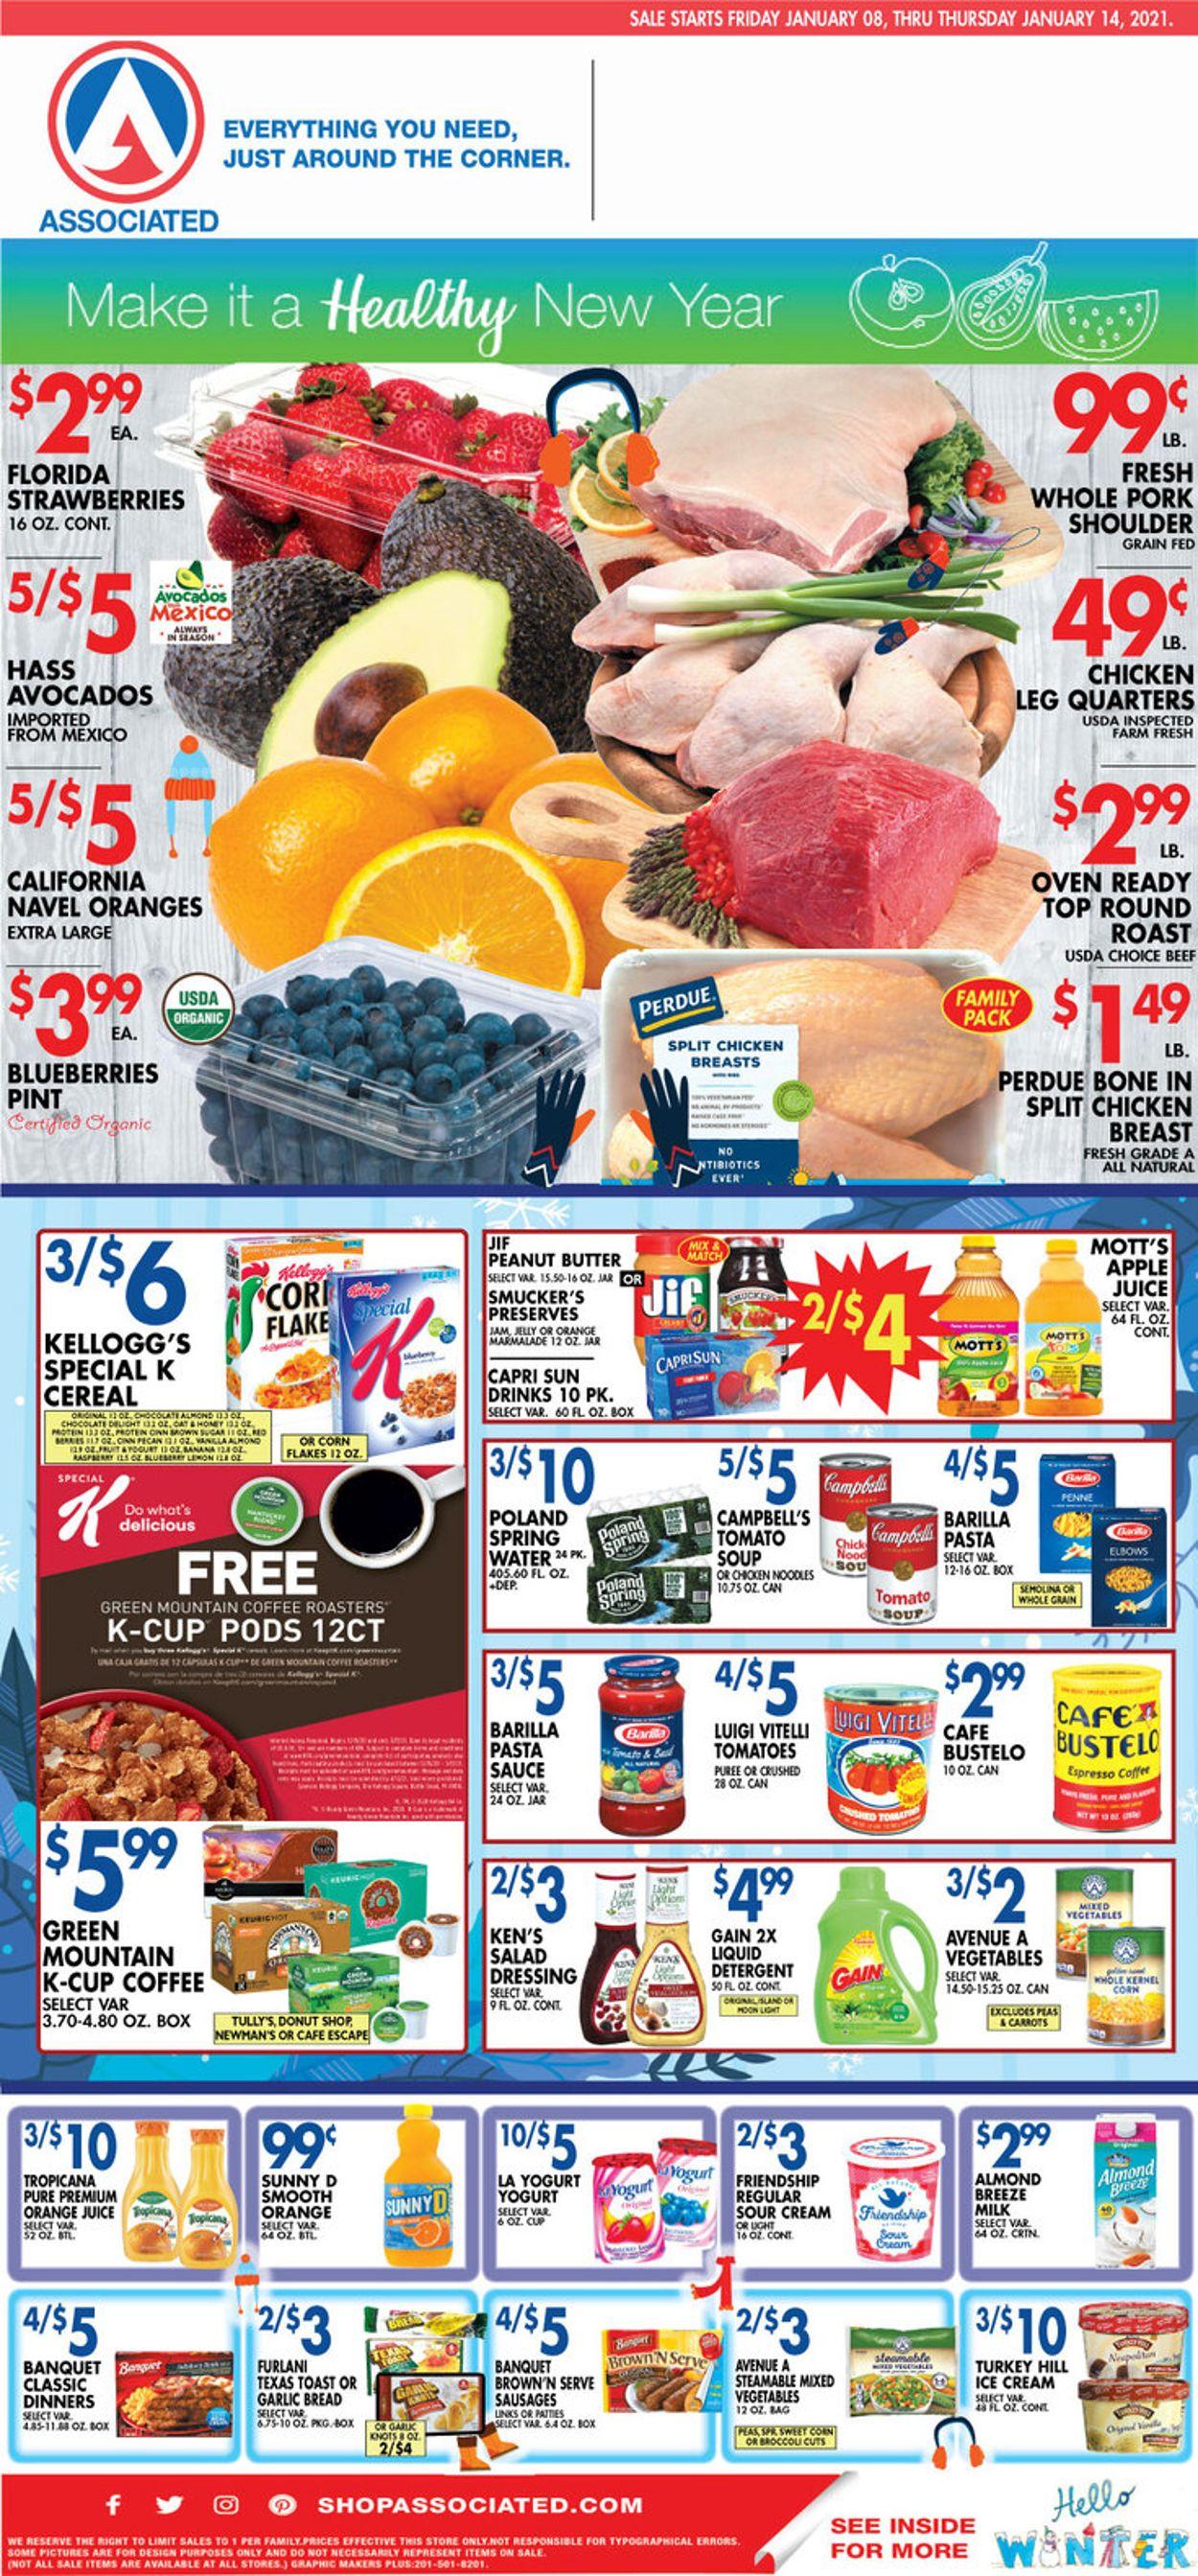 Associated Supermarkets Weekly Ad Circular - valid 01/08-01/14/2021